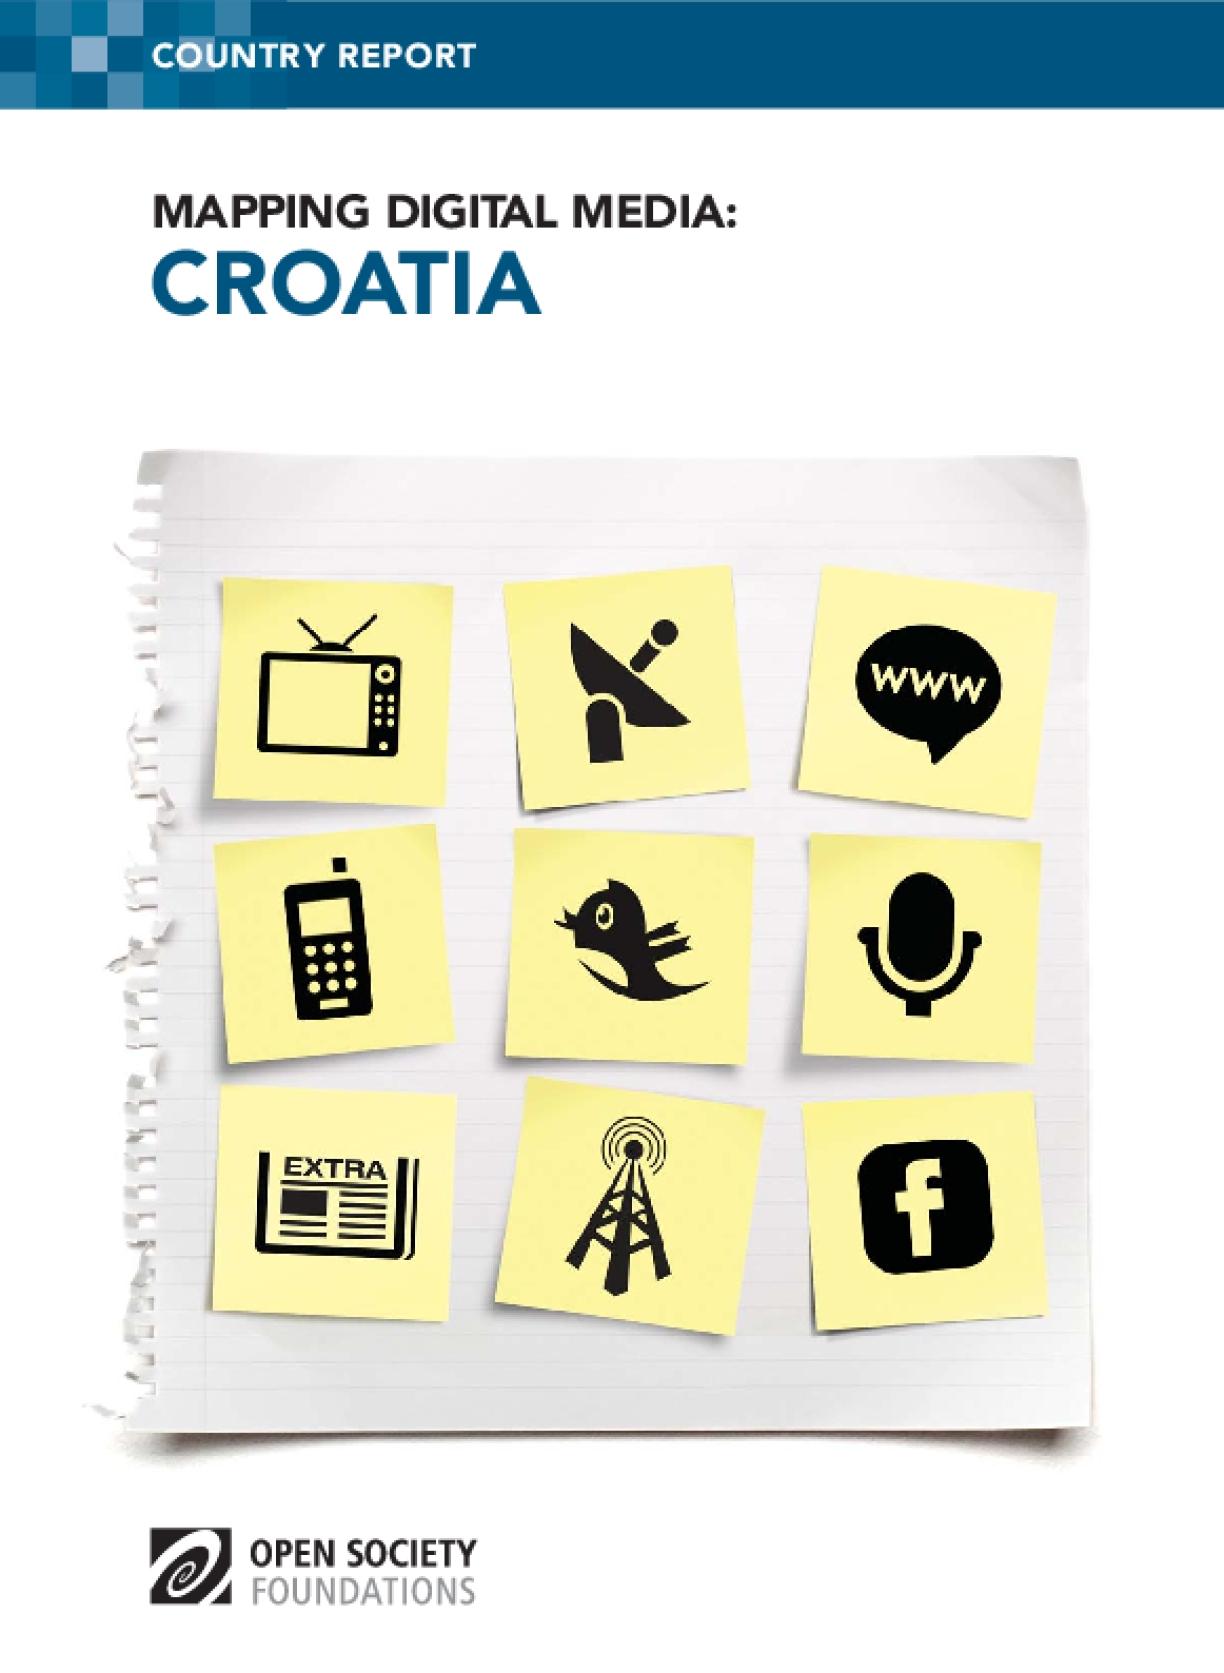 Mapping Digital Media: Croatia